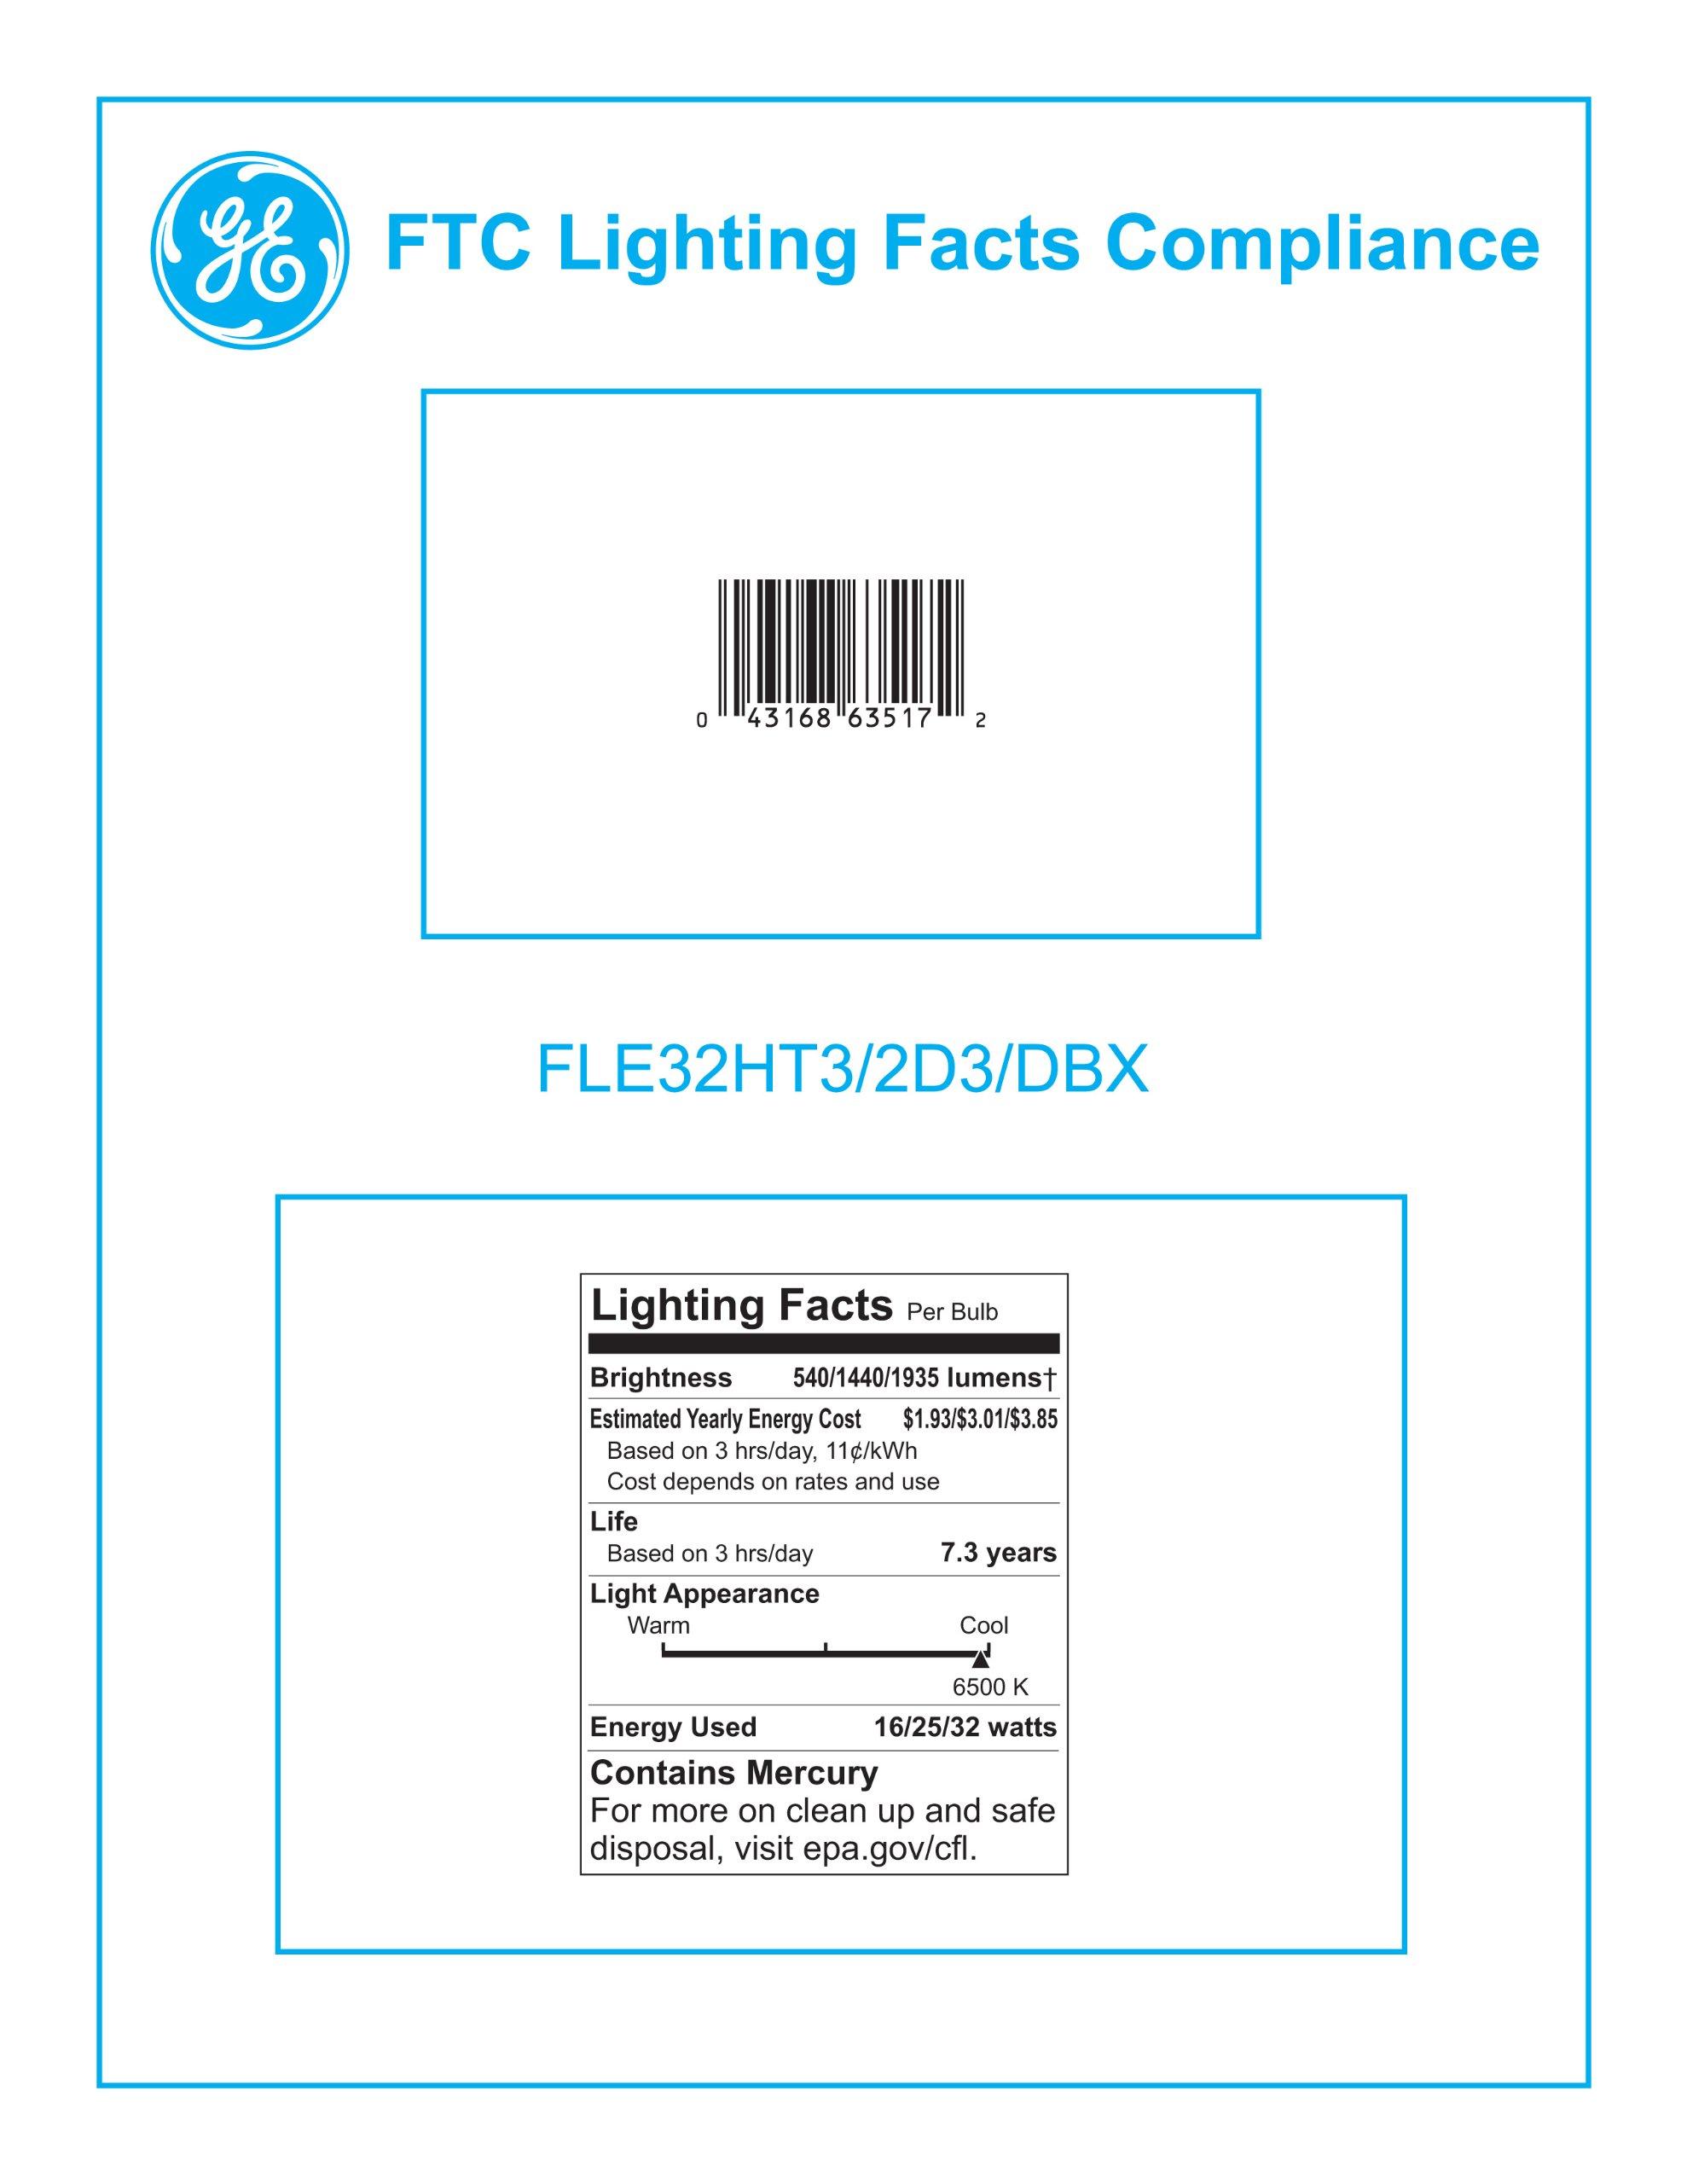 GE Lighting 63517 Energy Smart CFL 3-way 16/25/32-Watt (150-watt replacement) 540/1440/1935-Lumen T3 Spiral Light Bulb with Medium Base, 6-Pack